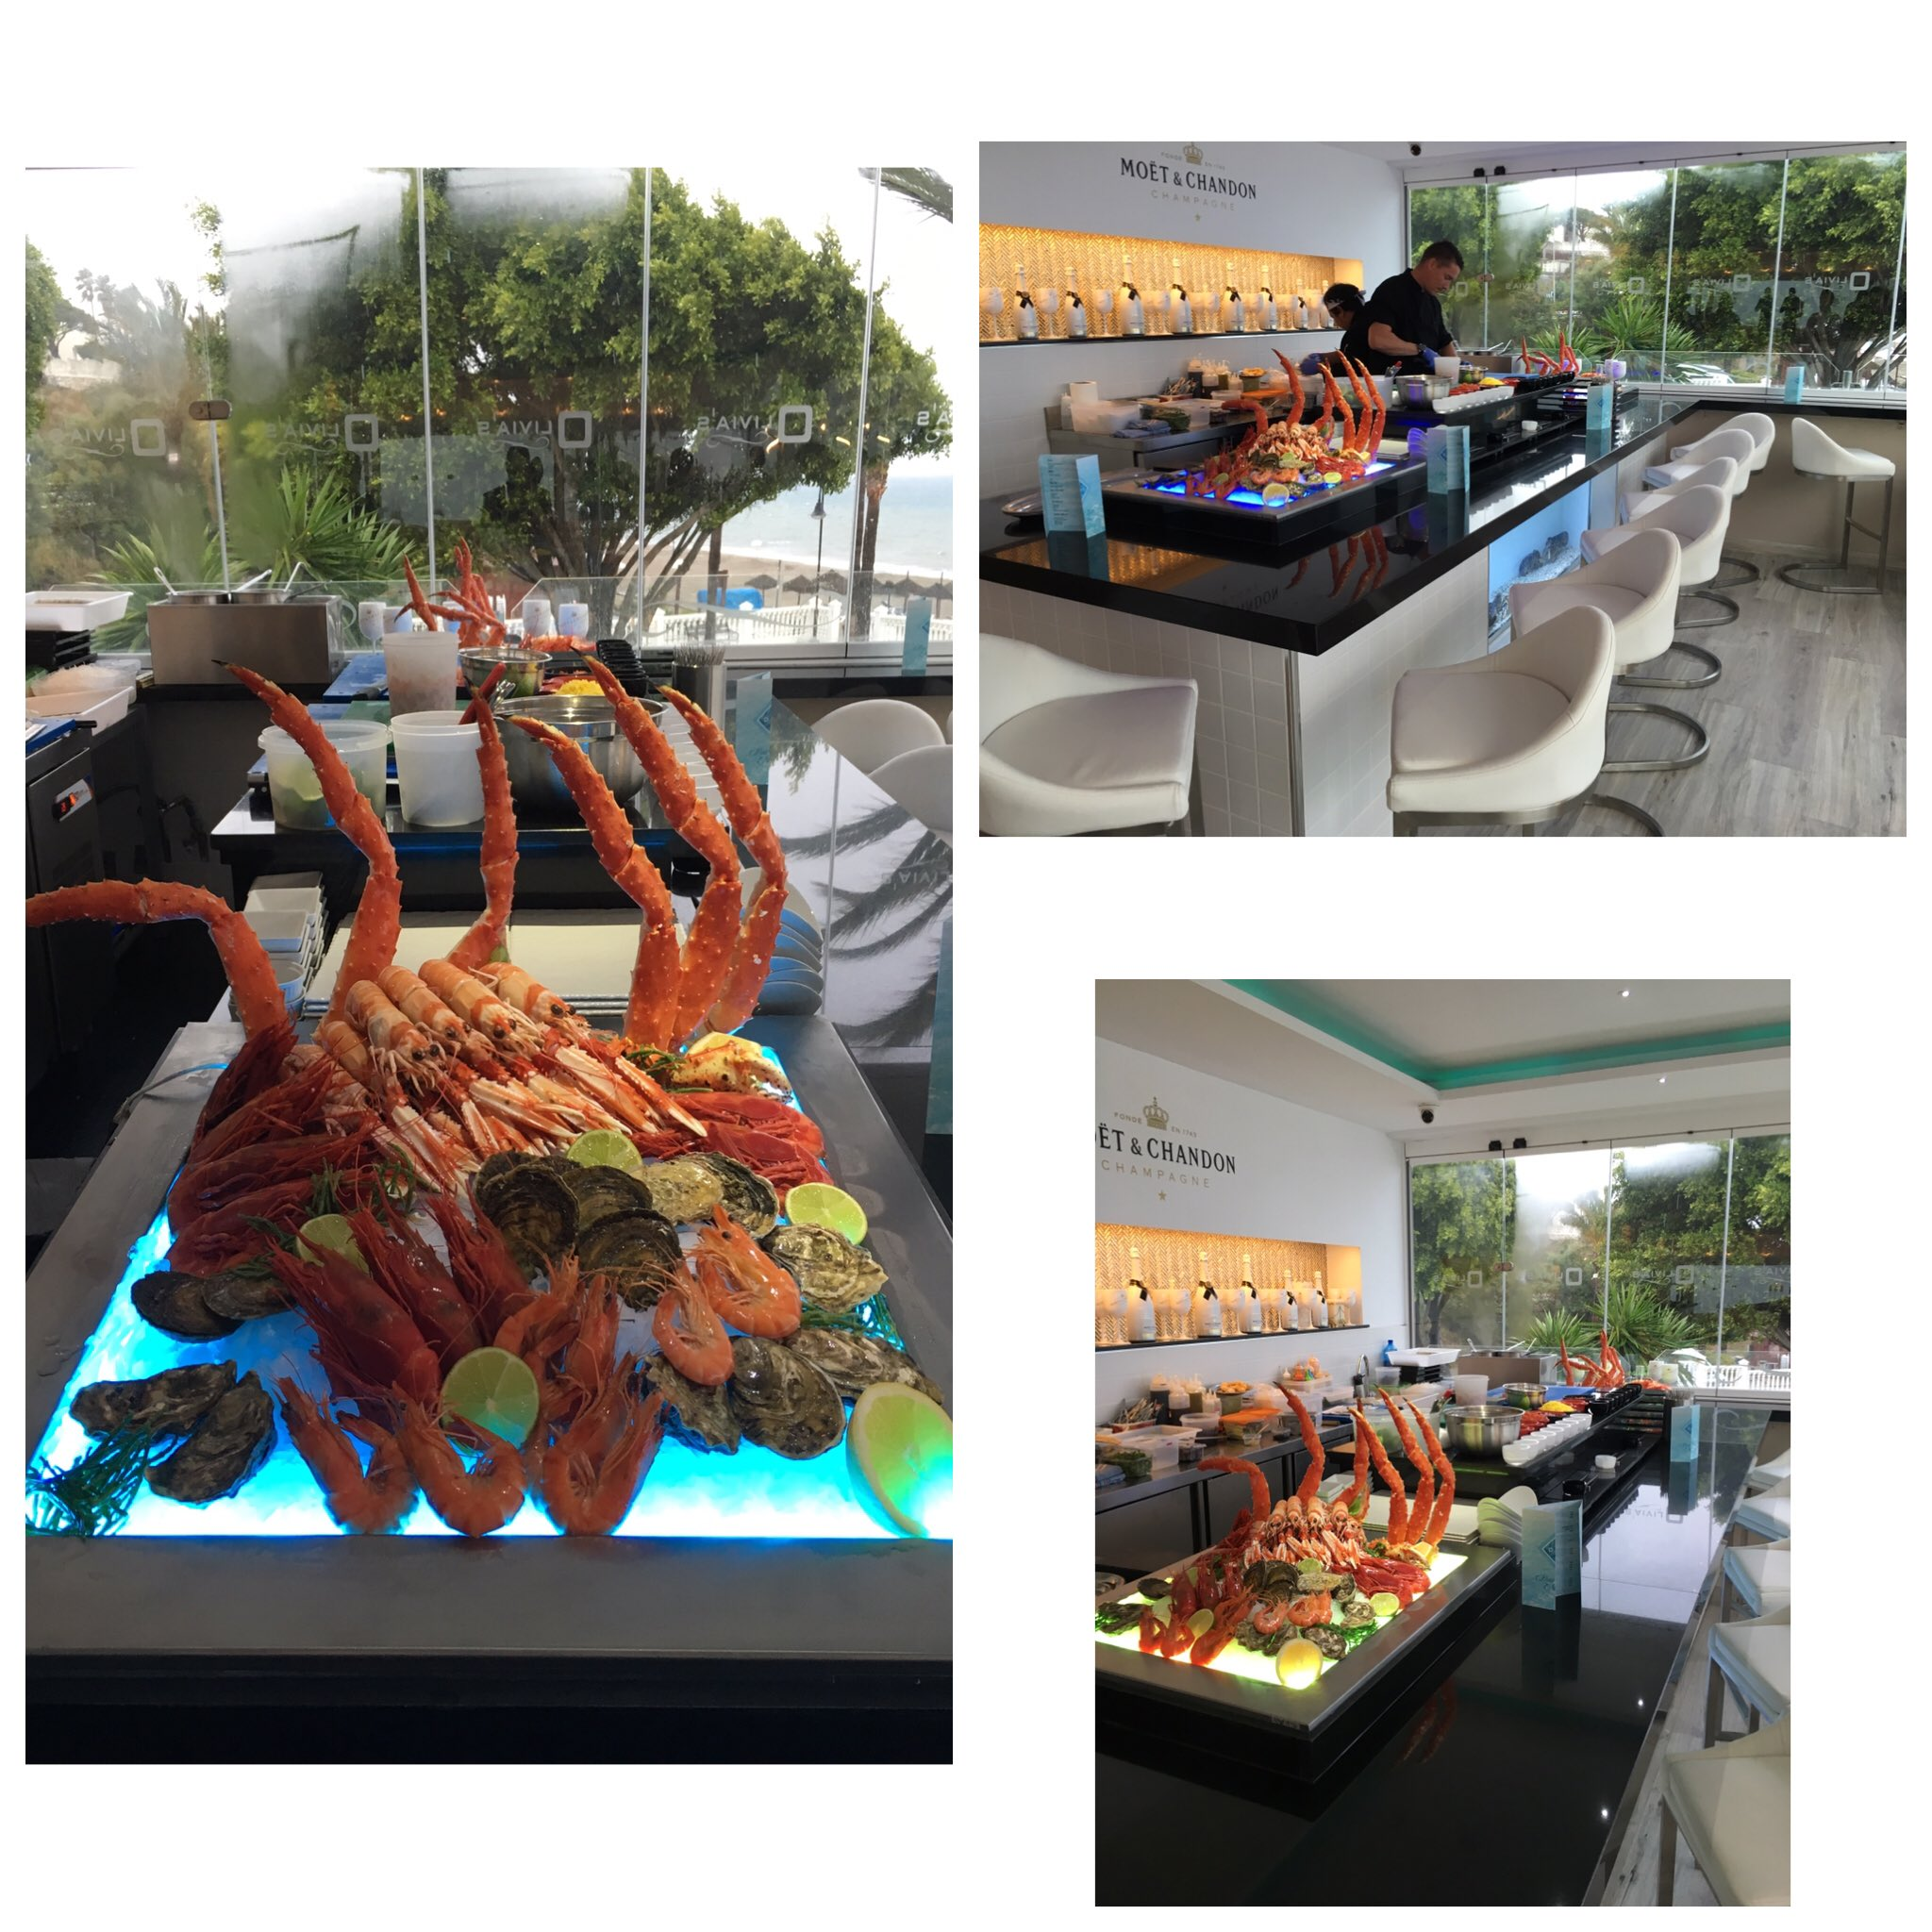 Seafood/RawBar @oliviaslacala 🔥🔥🔥 #Unreal #Excited #ConceptComplete #ItvBE @itvbe https://t.co/iCafqwuR7U